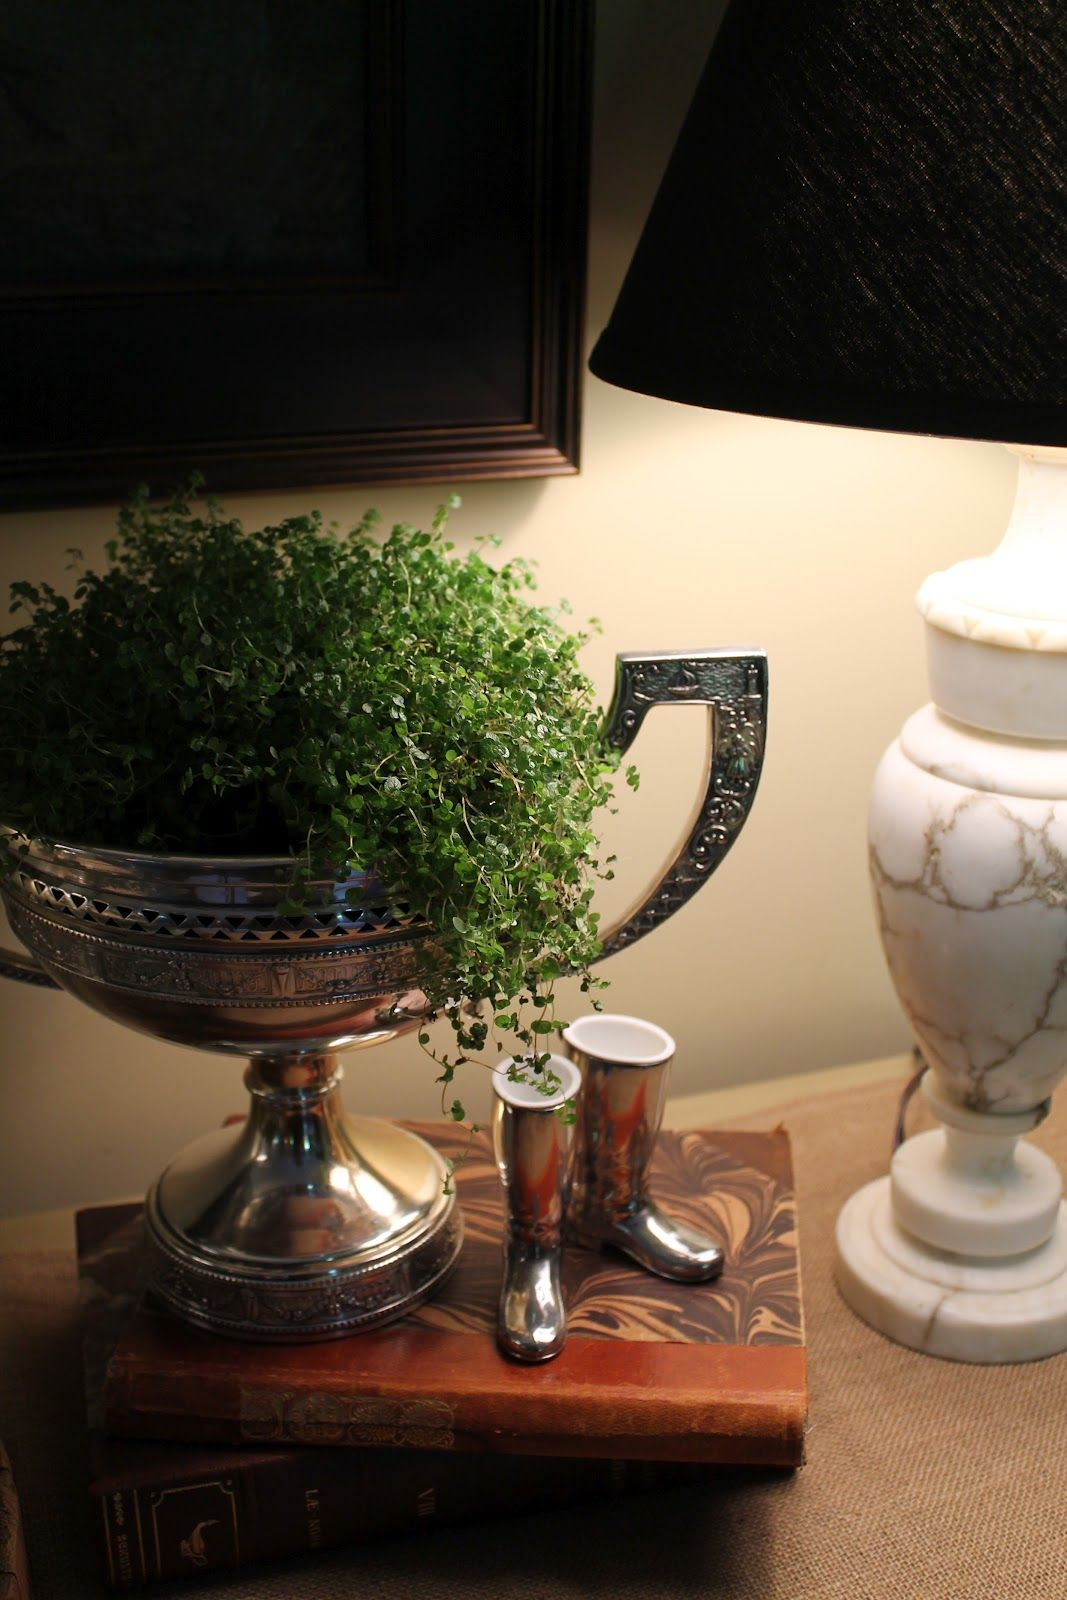 Trophy Room Design Ideas: Equestrian Decor, Old Trophies, Decor